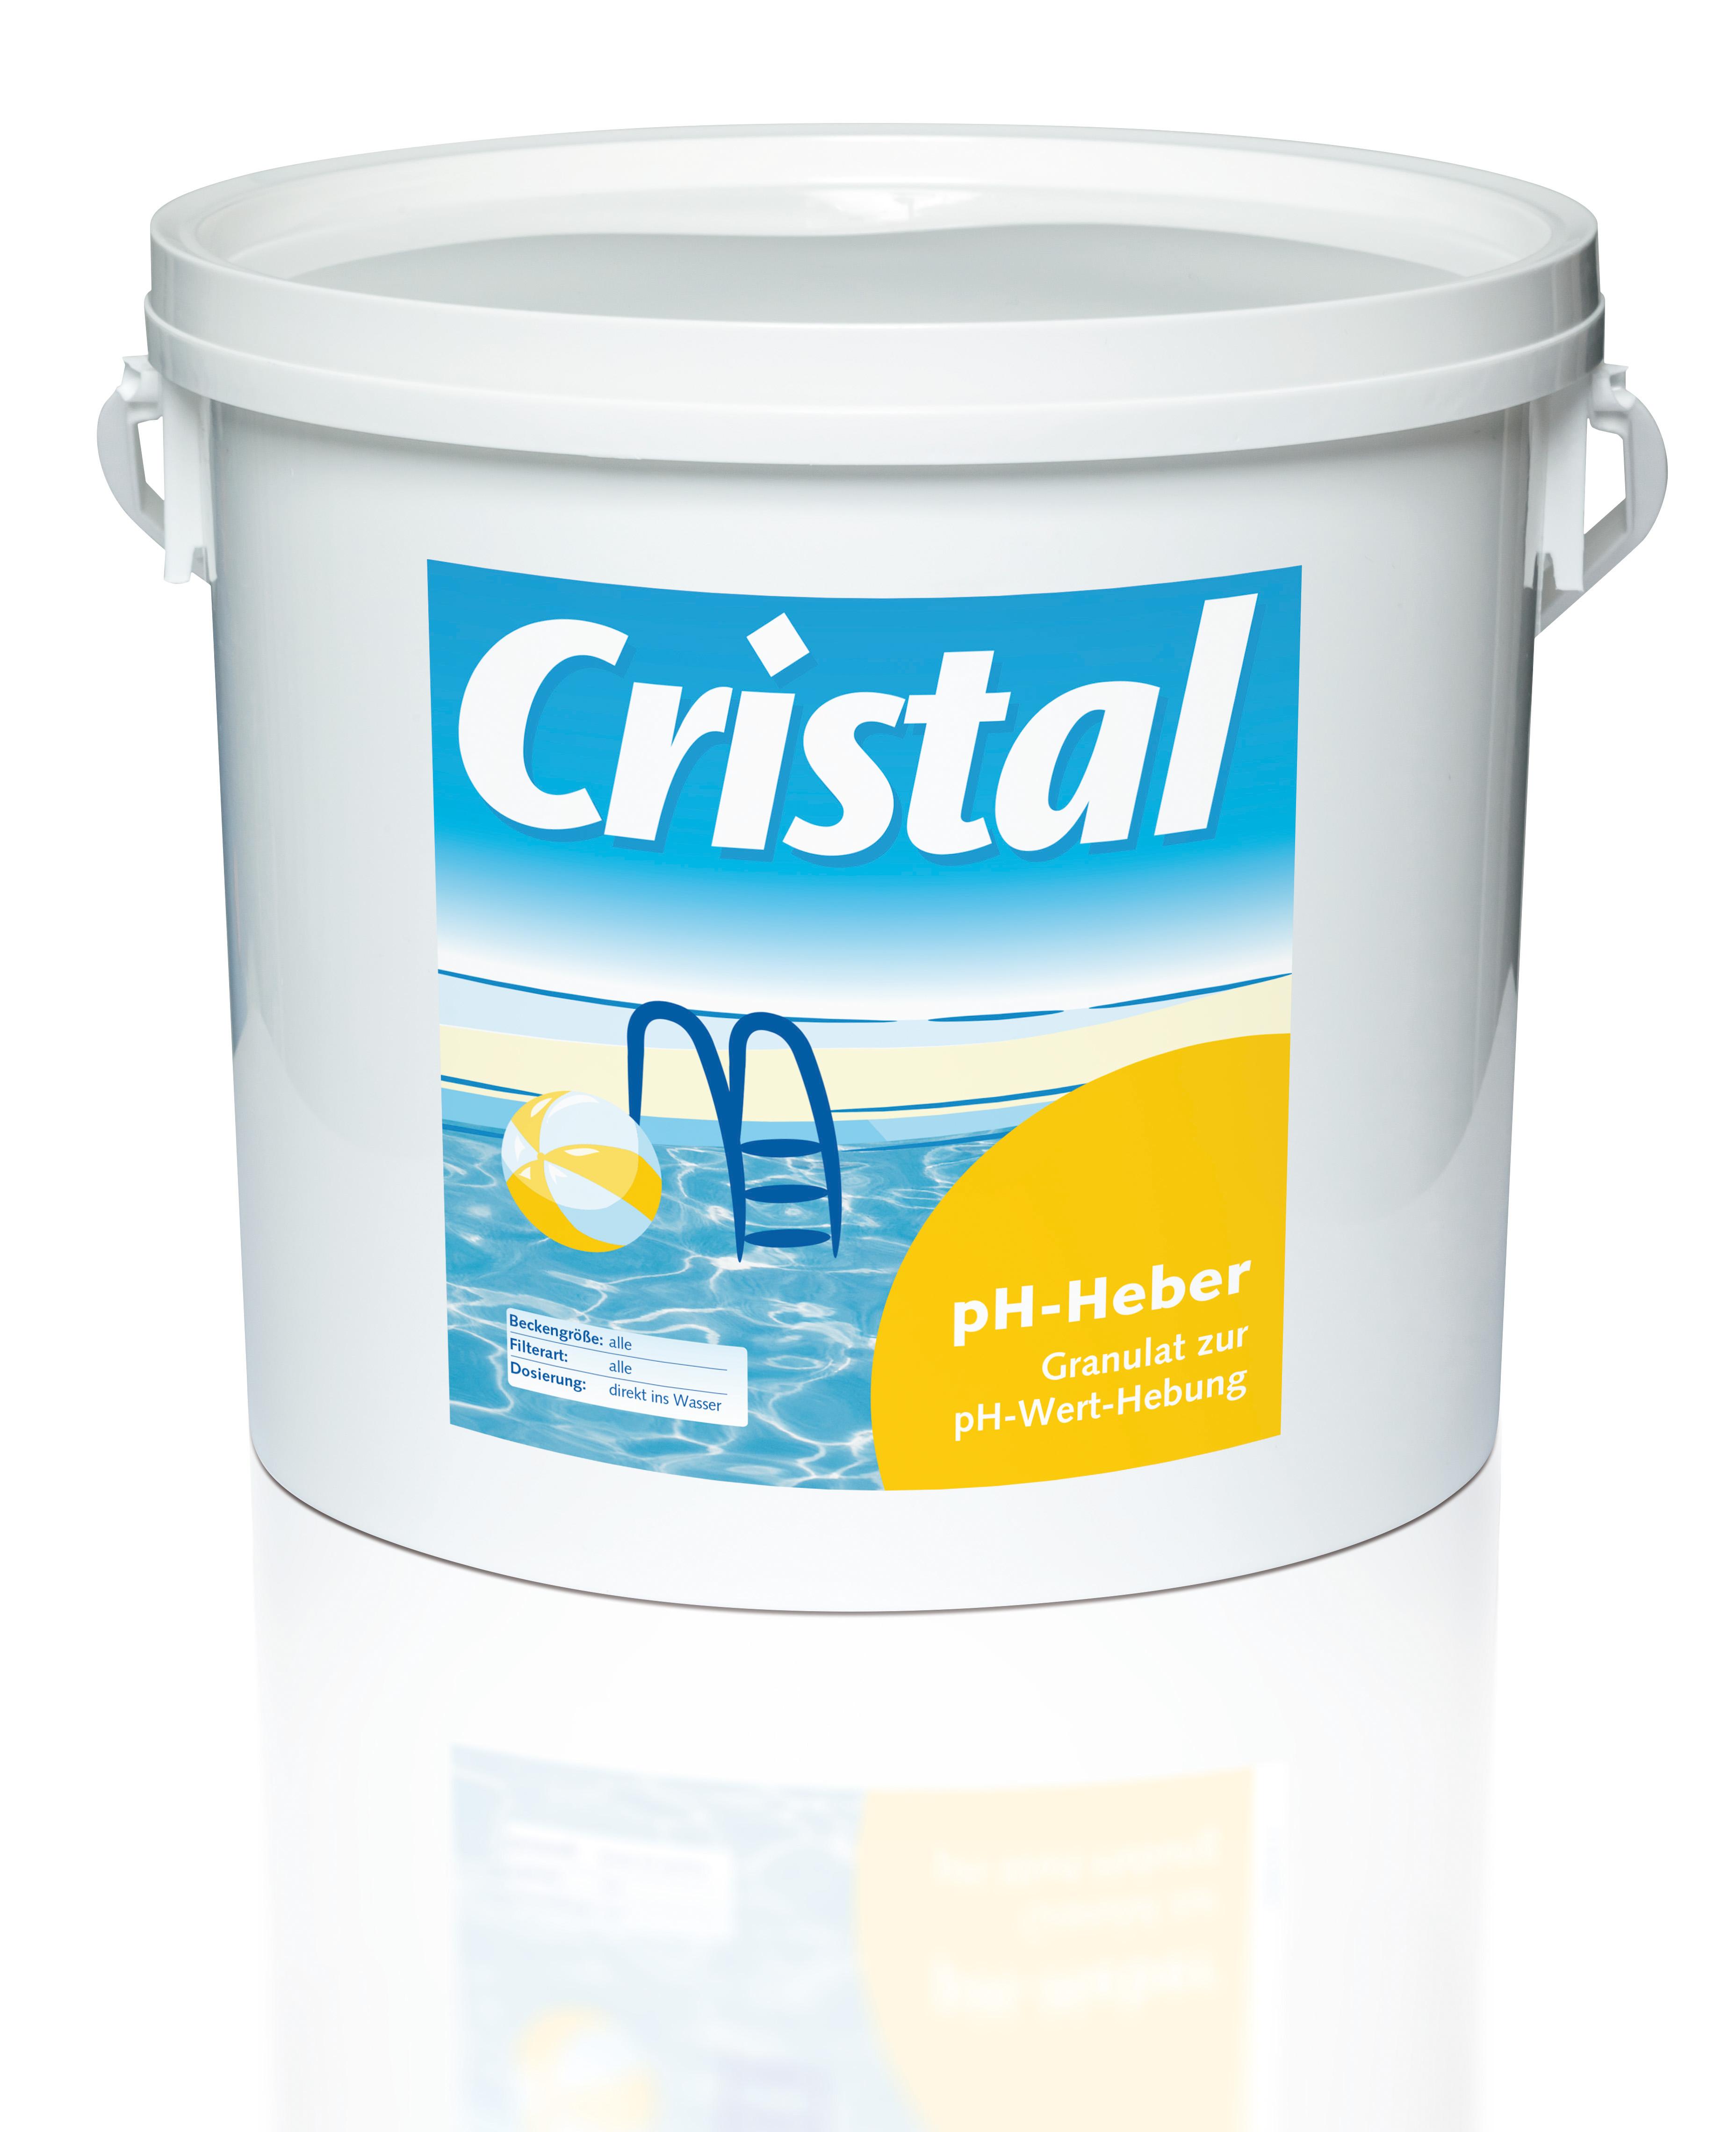 Cristal SET pH-Senker 6kg und pH-Heber 5kg